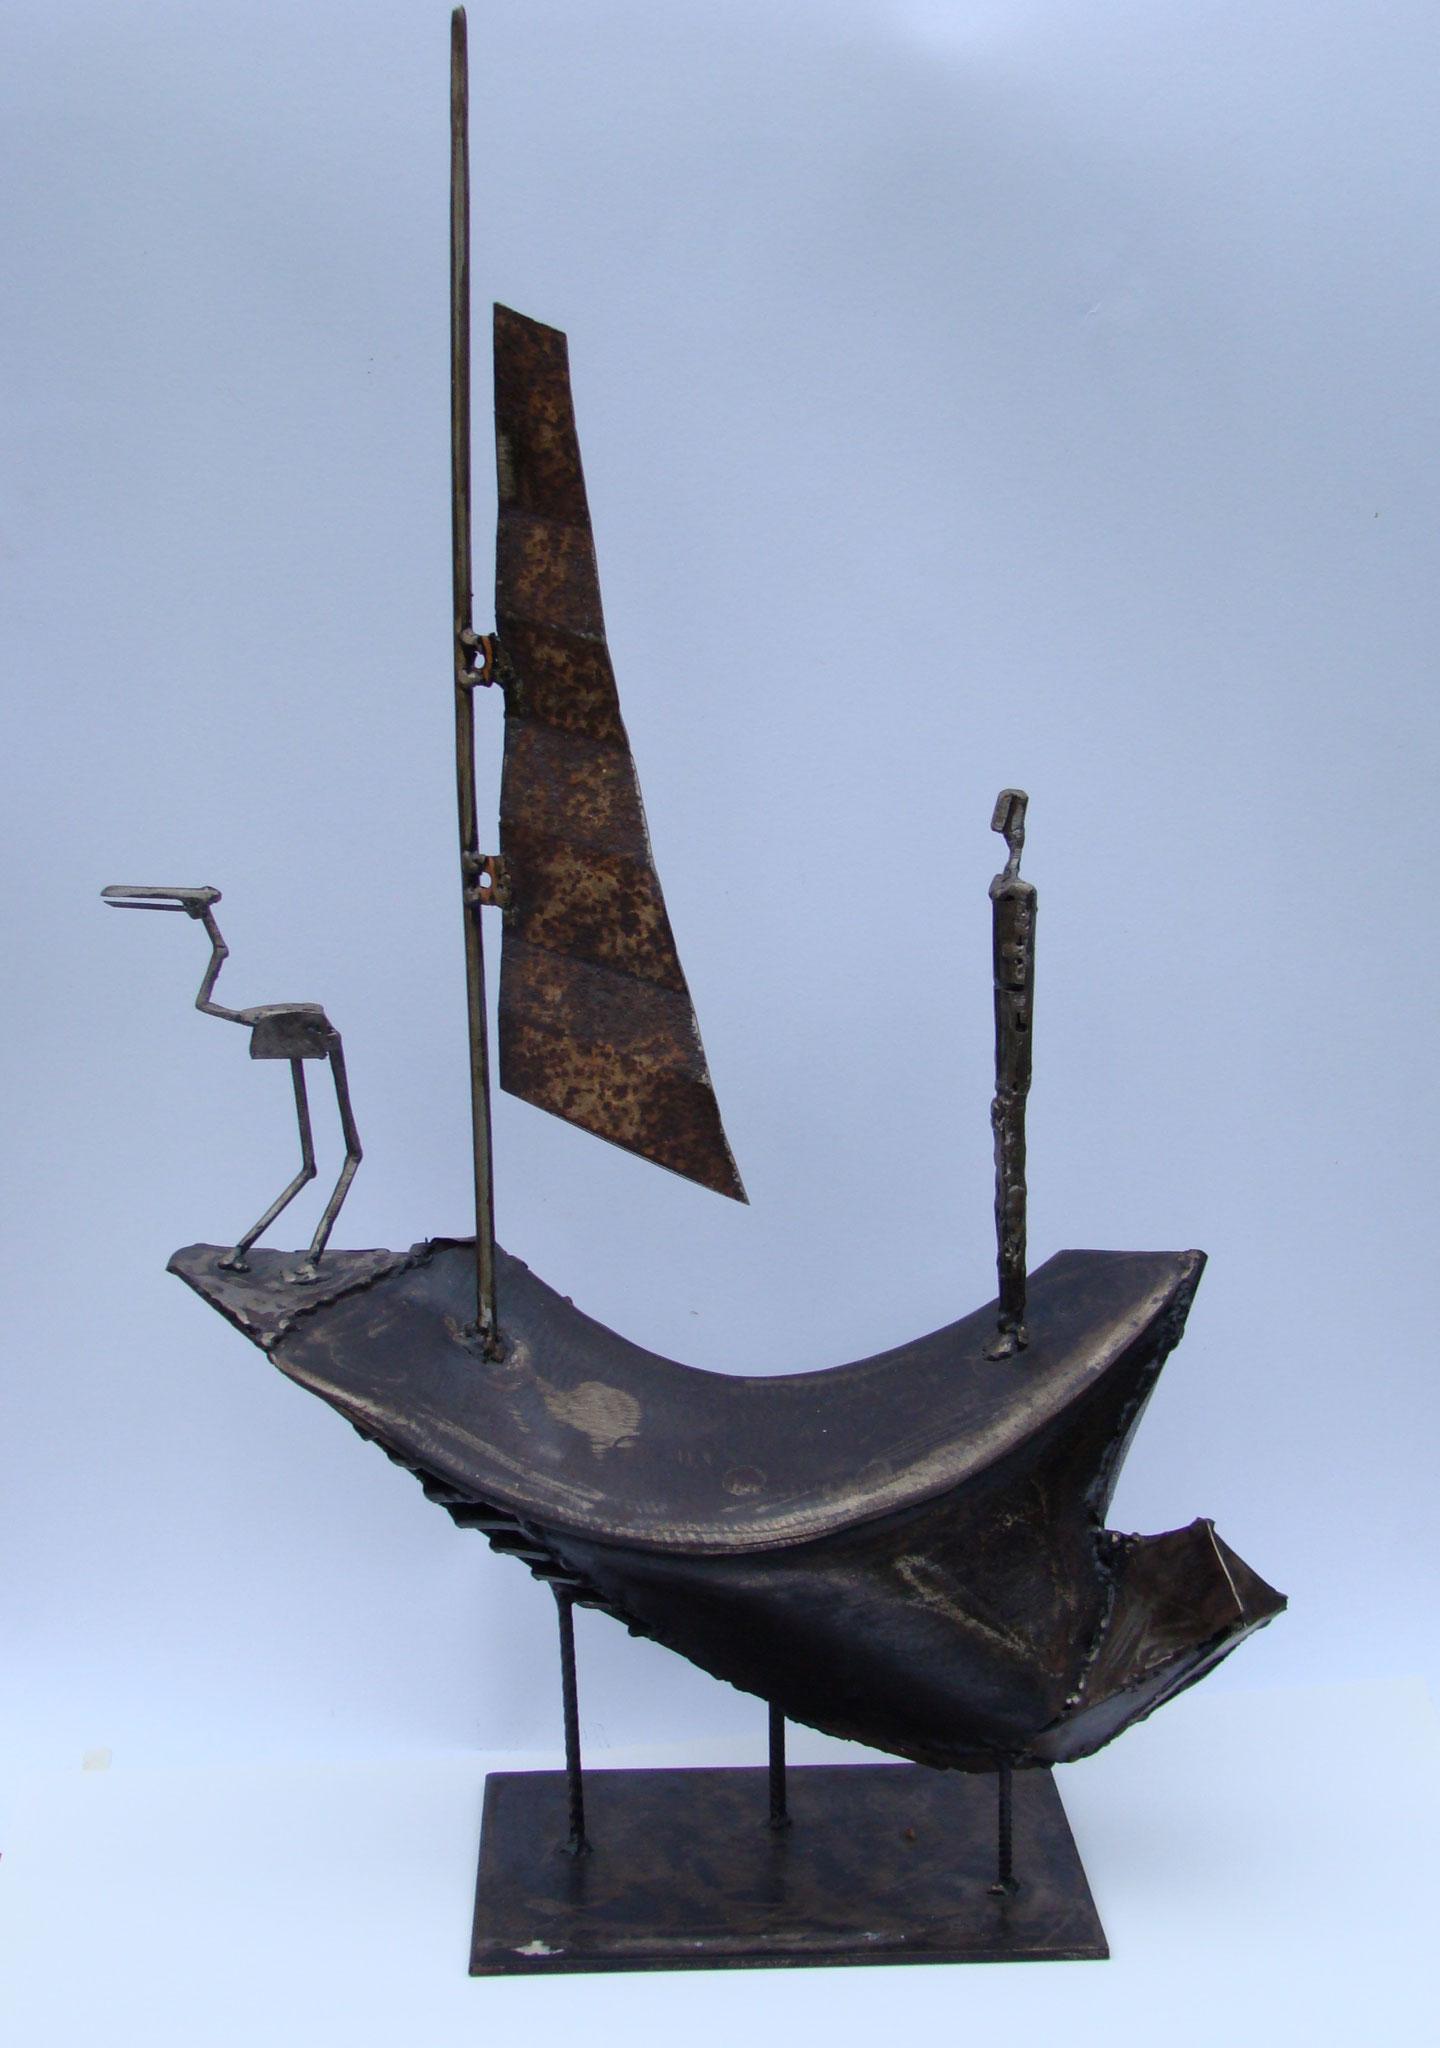 Charon, Stahl, 2007, 70 x 45 cm